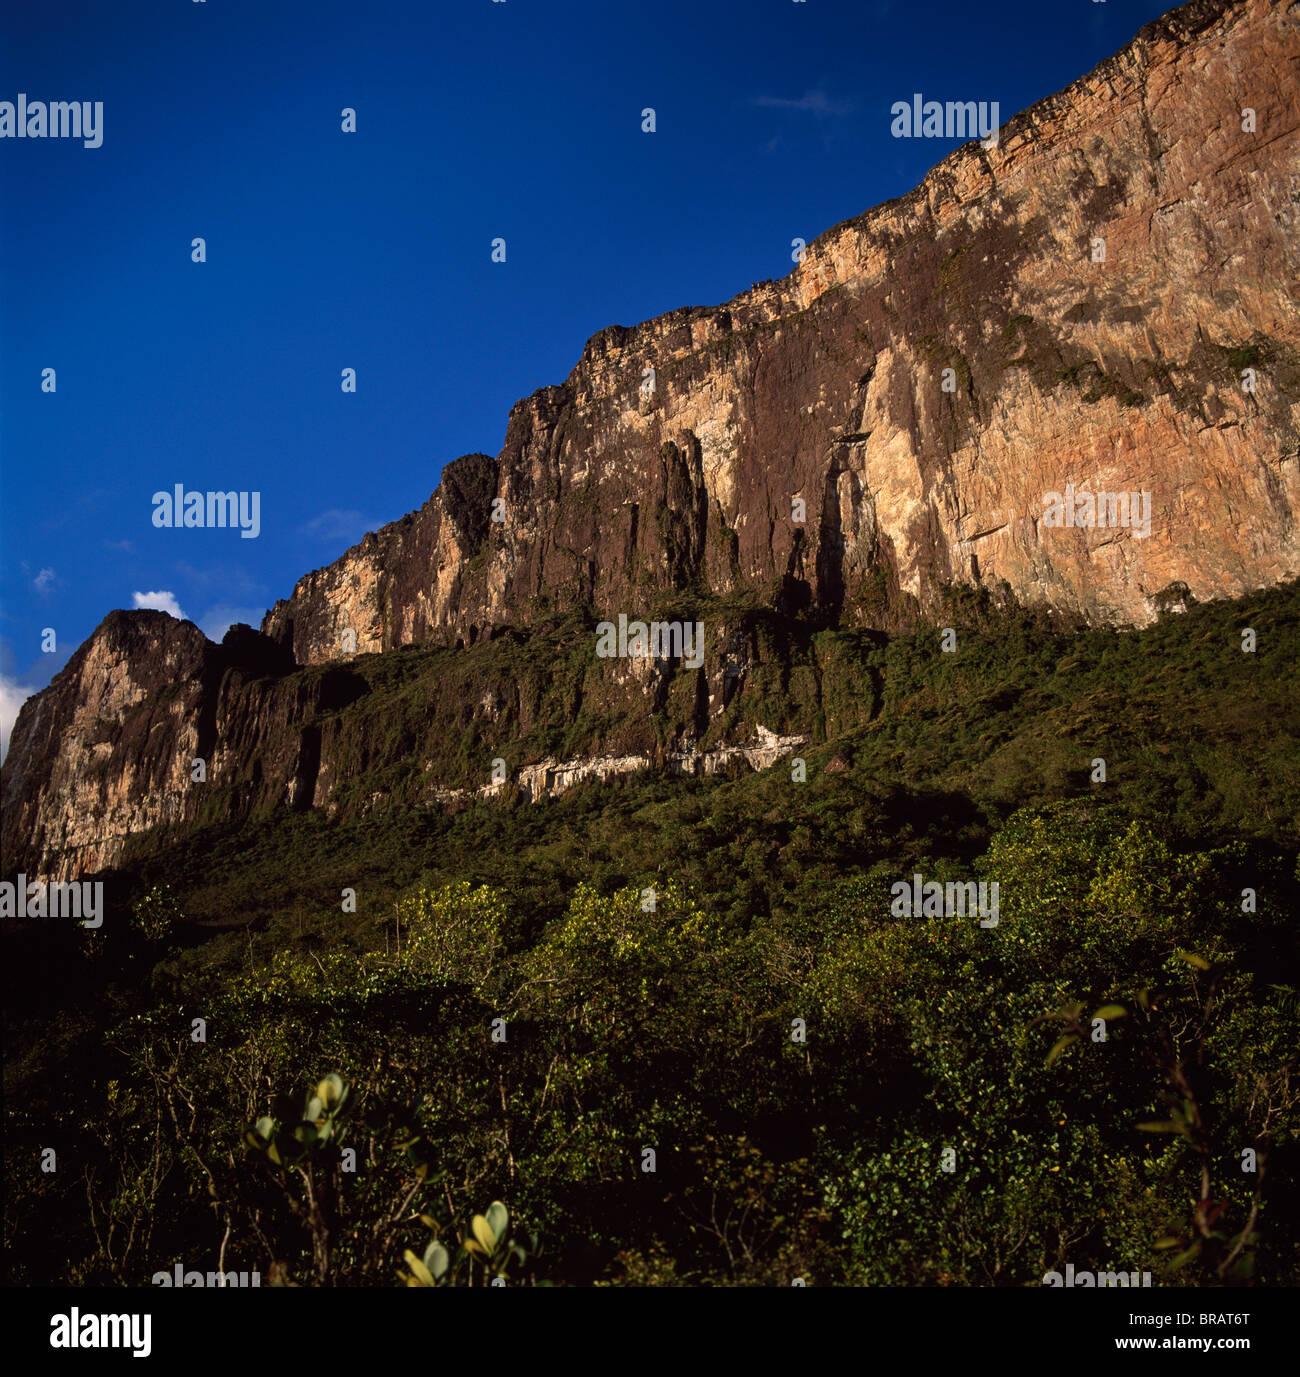 Ascent ledge on southwest cliff, Mount Roraima (Cerro Roraima), Tepuis, Estado Bolivar, Venezuela, South America - Stock Image